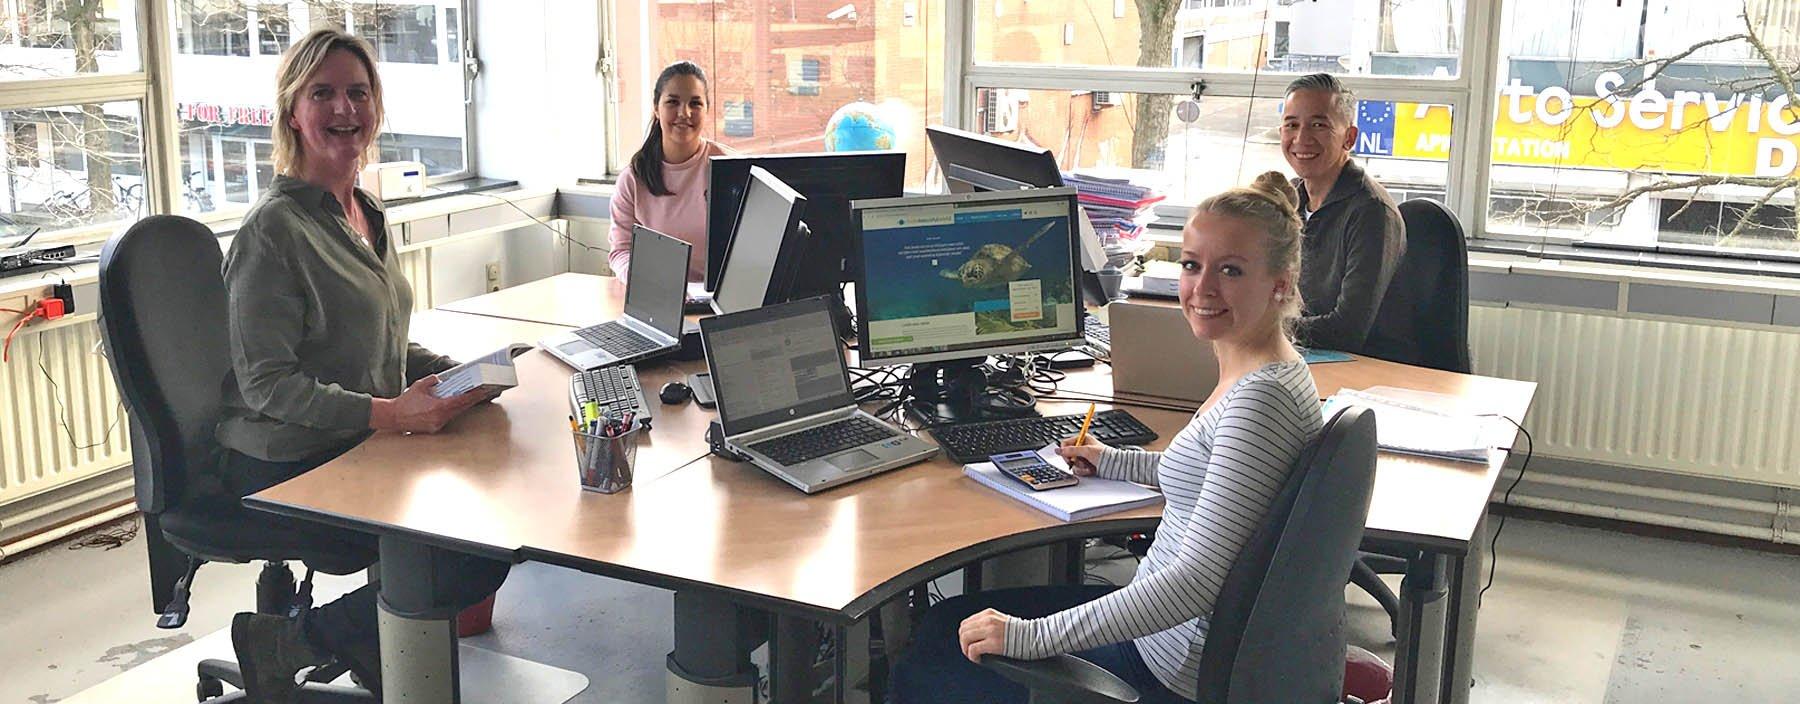 Op kantoor bij HelloBeautifulWorld: Lianne Lahey, Eliza van der Zwan, Alwin Setija en Marlène Ritsman